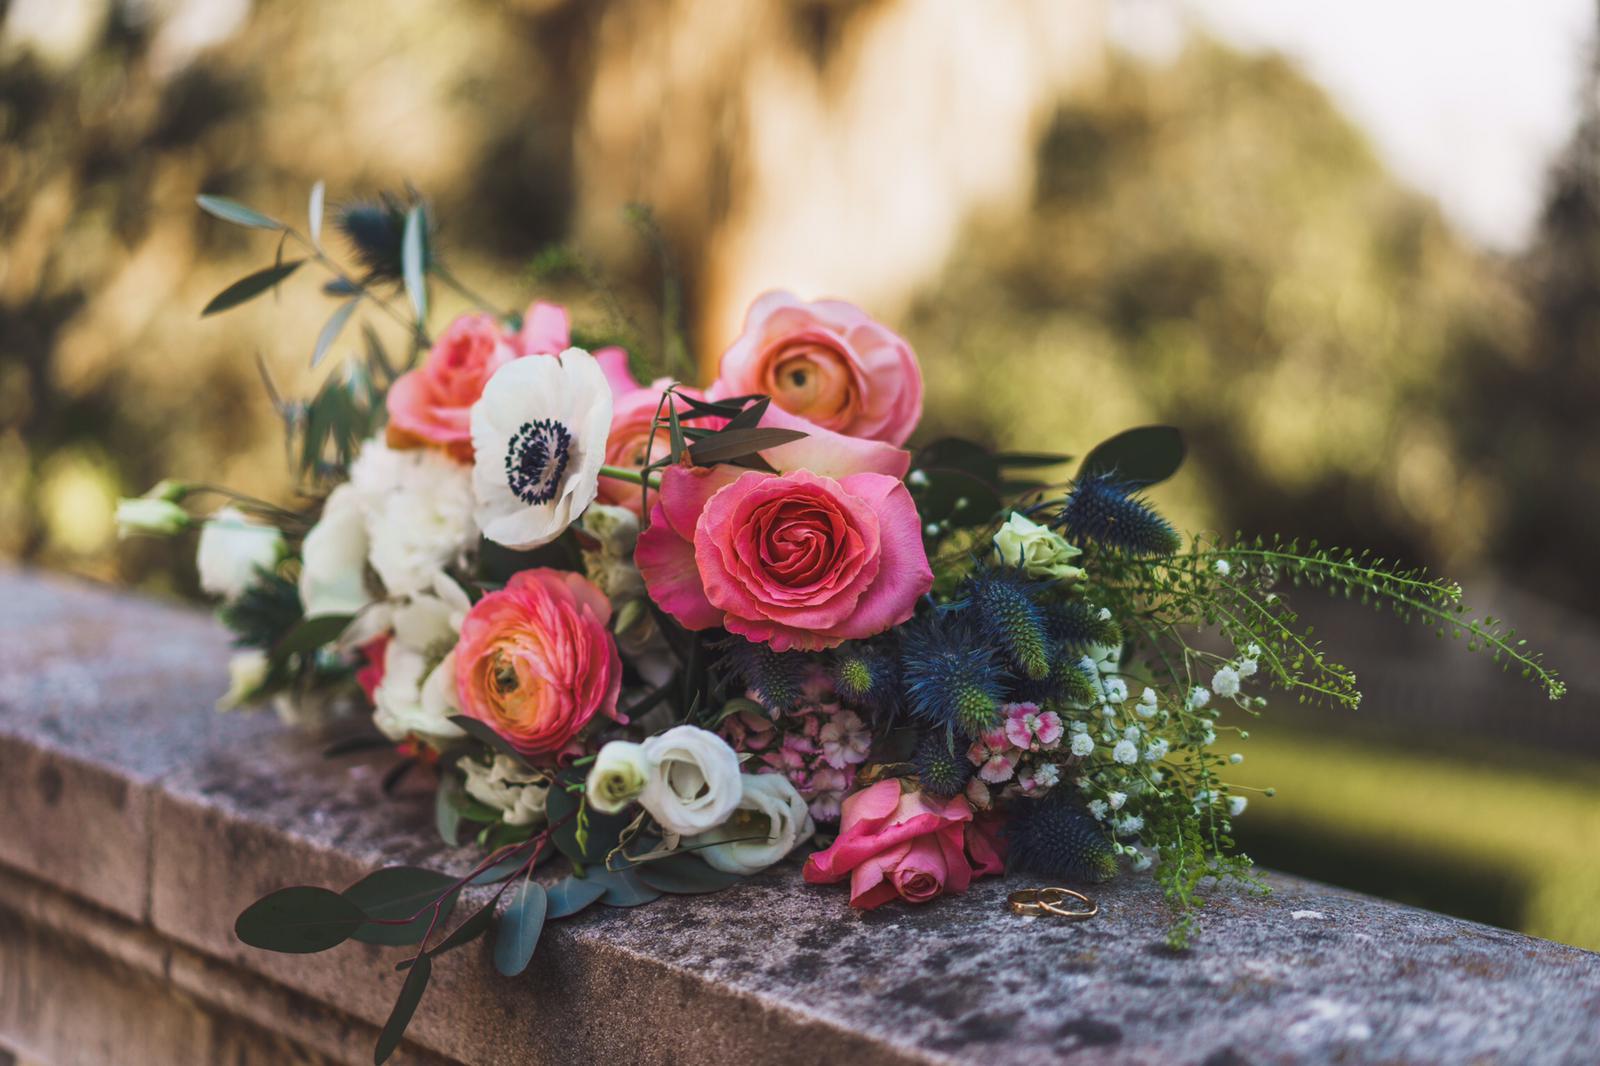 comprar ramos de flores